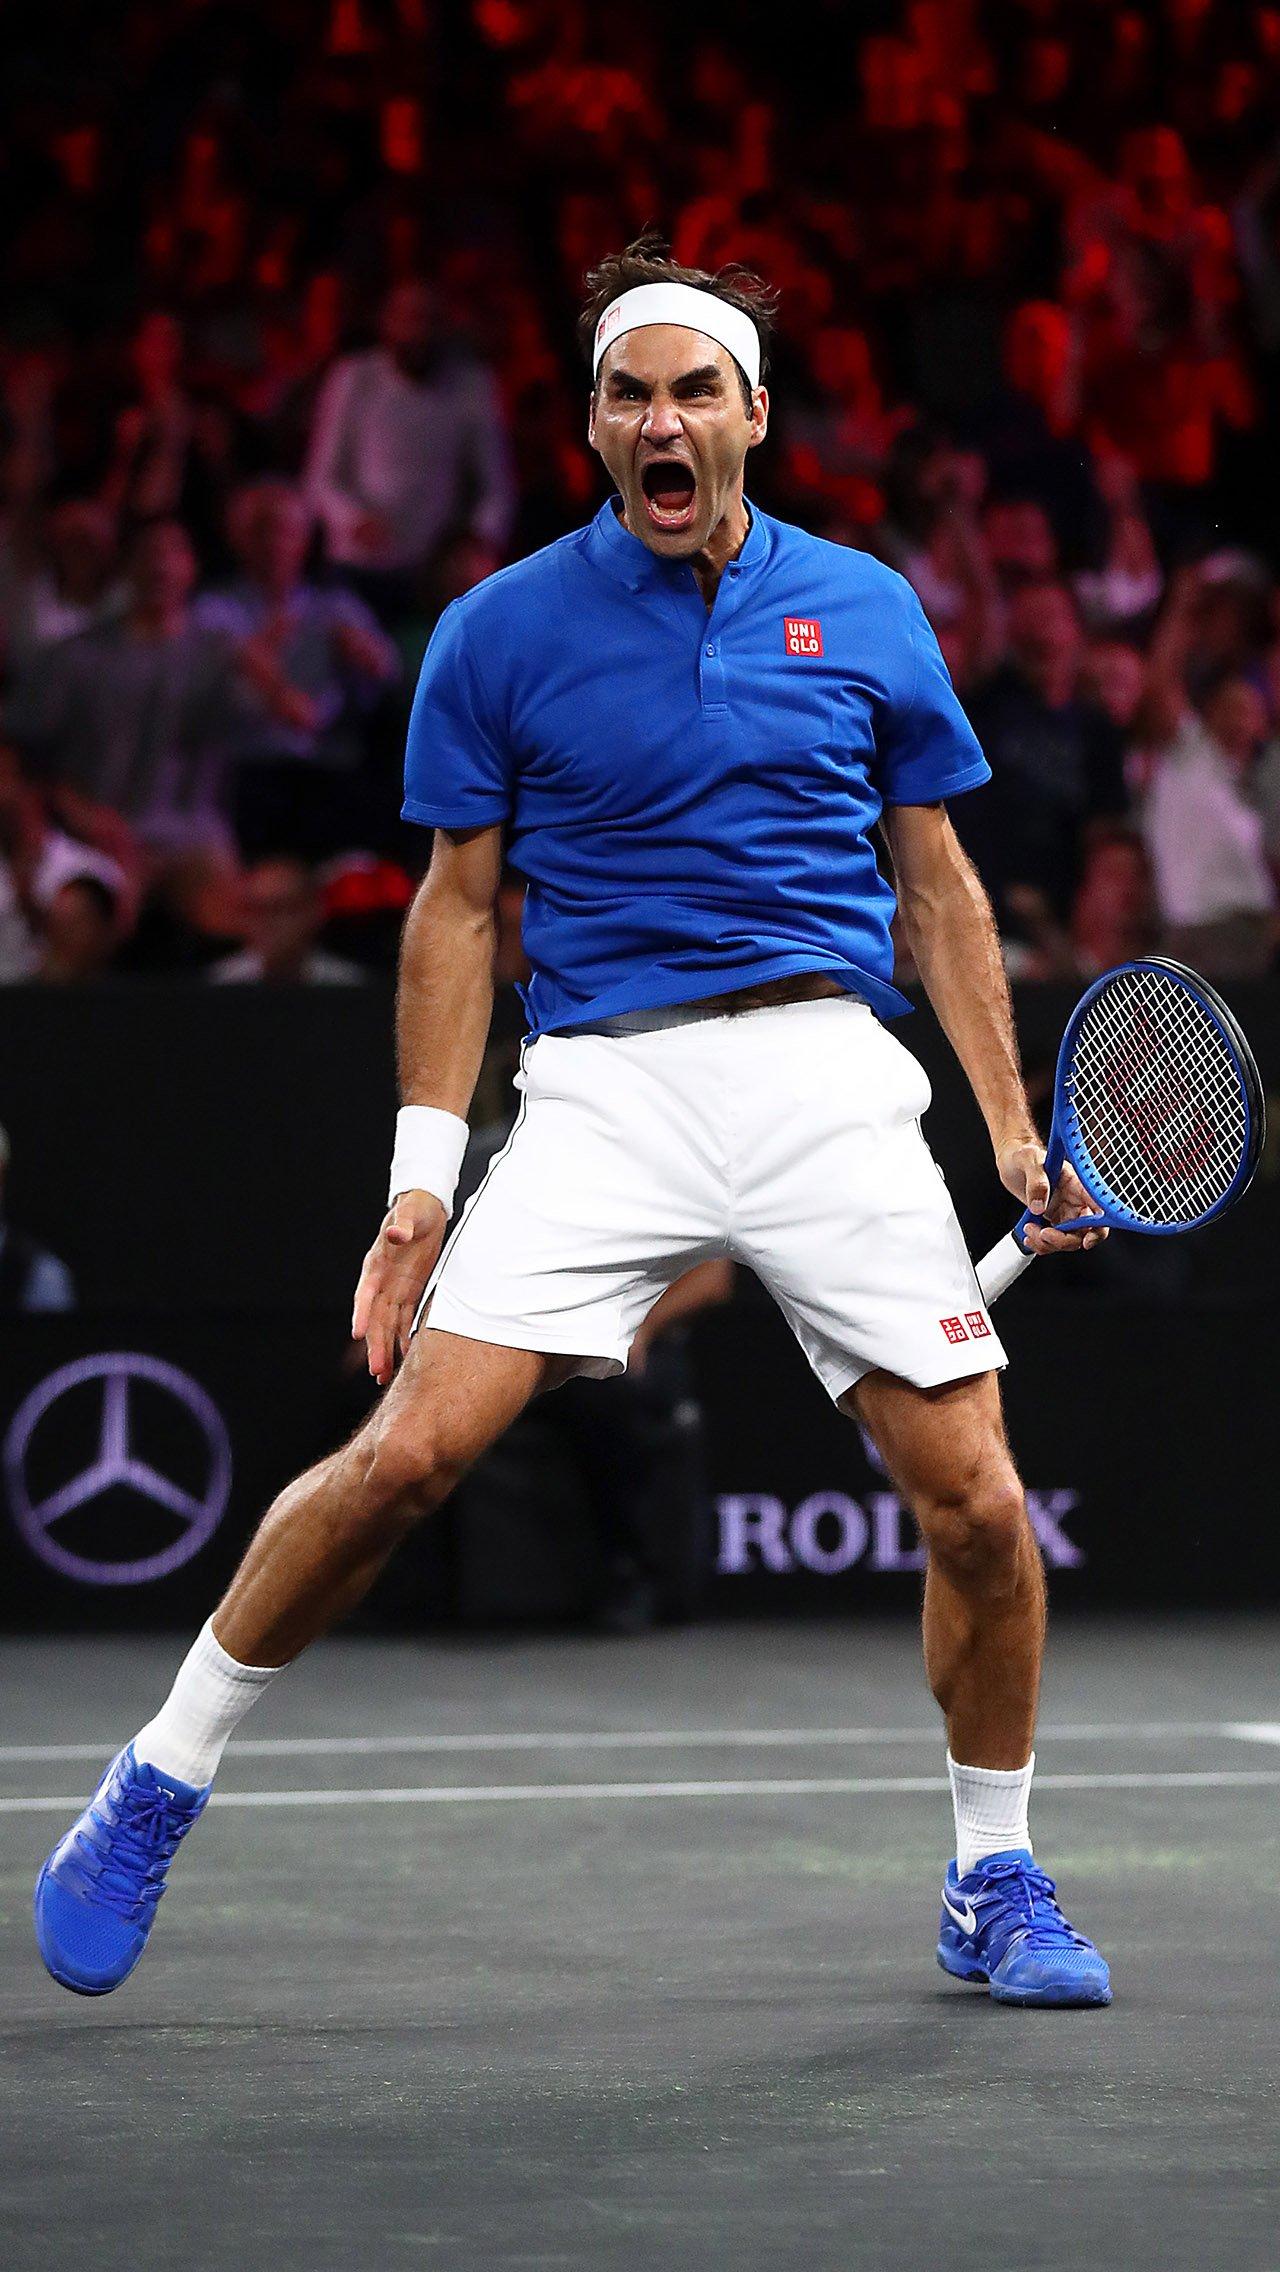 По данным Sportico, Роджер Федерер заработал за год $ 84 млн